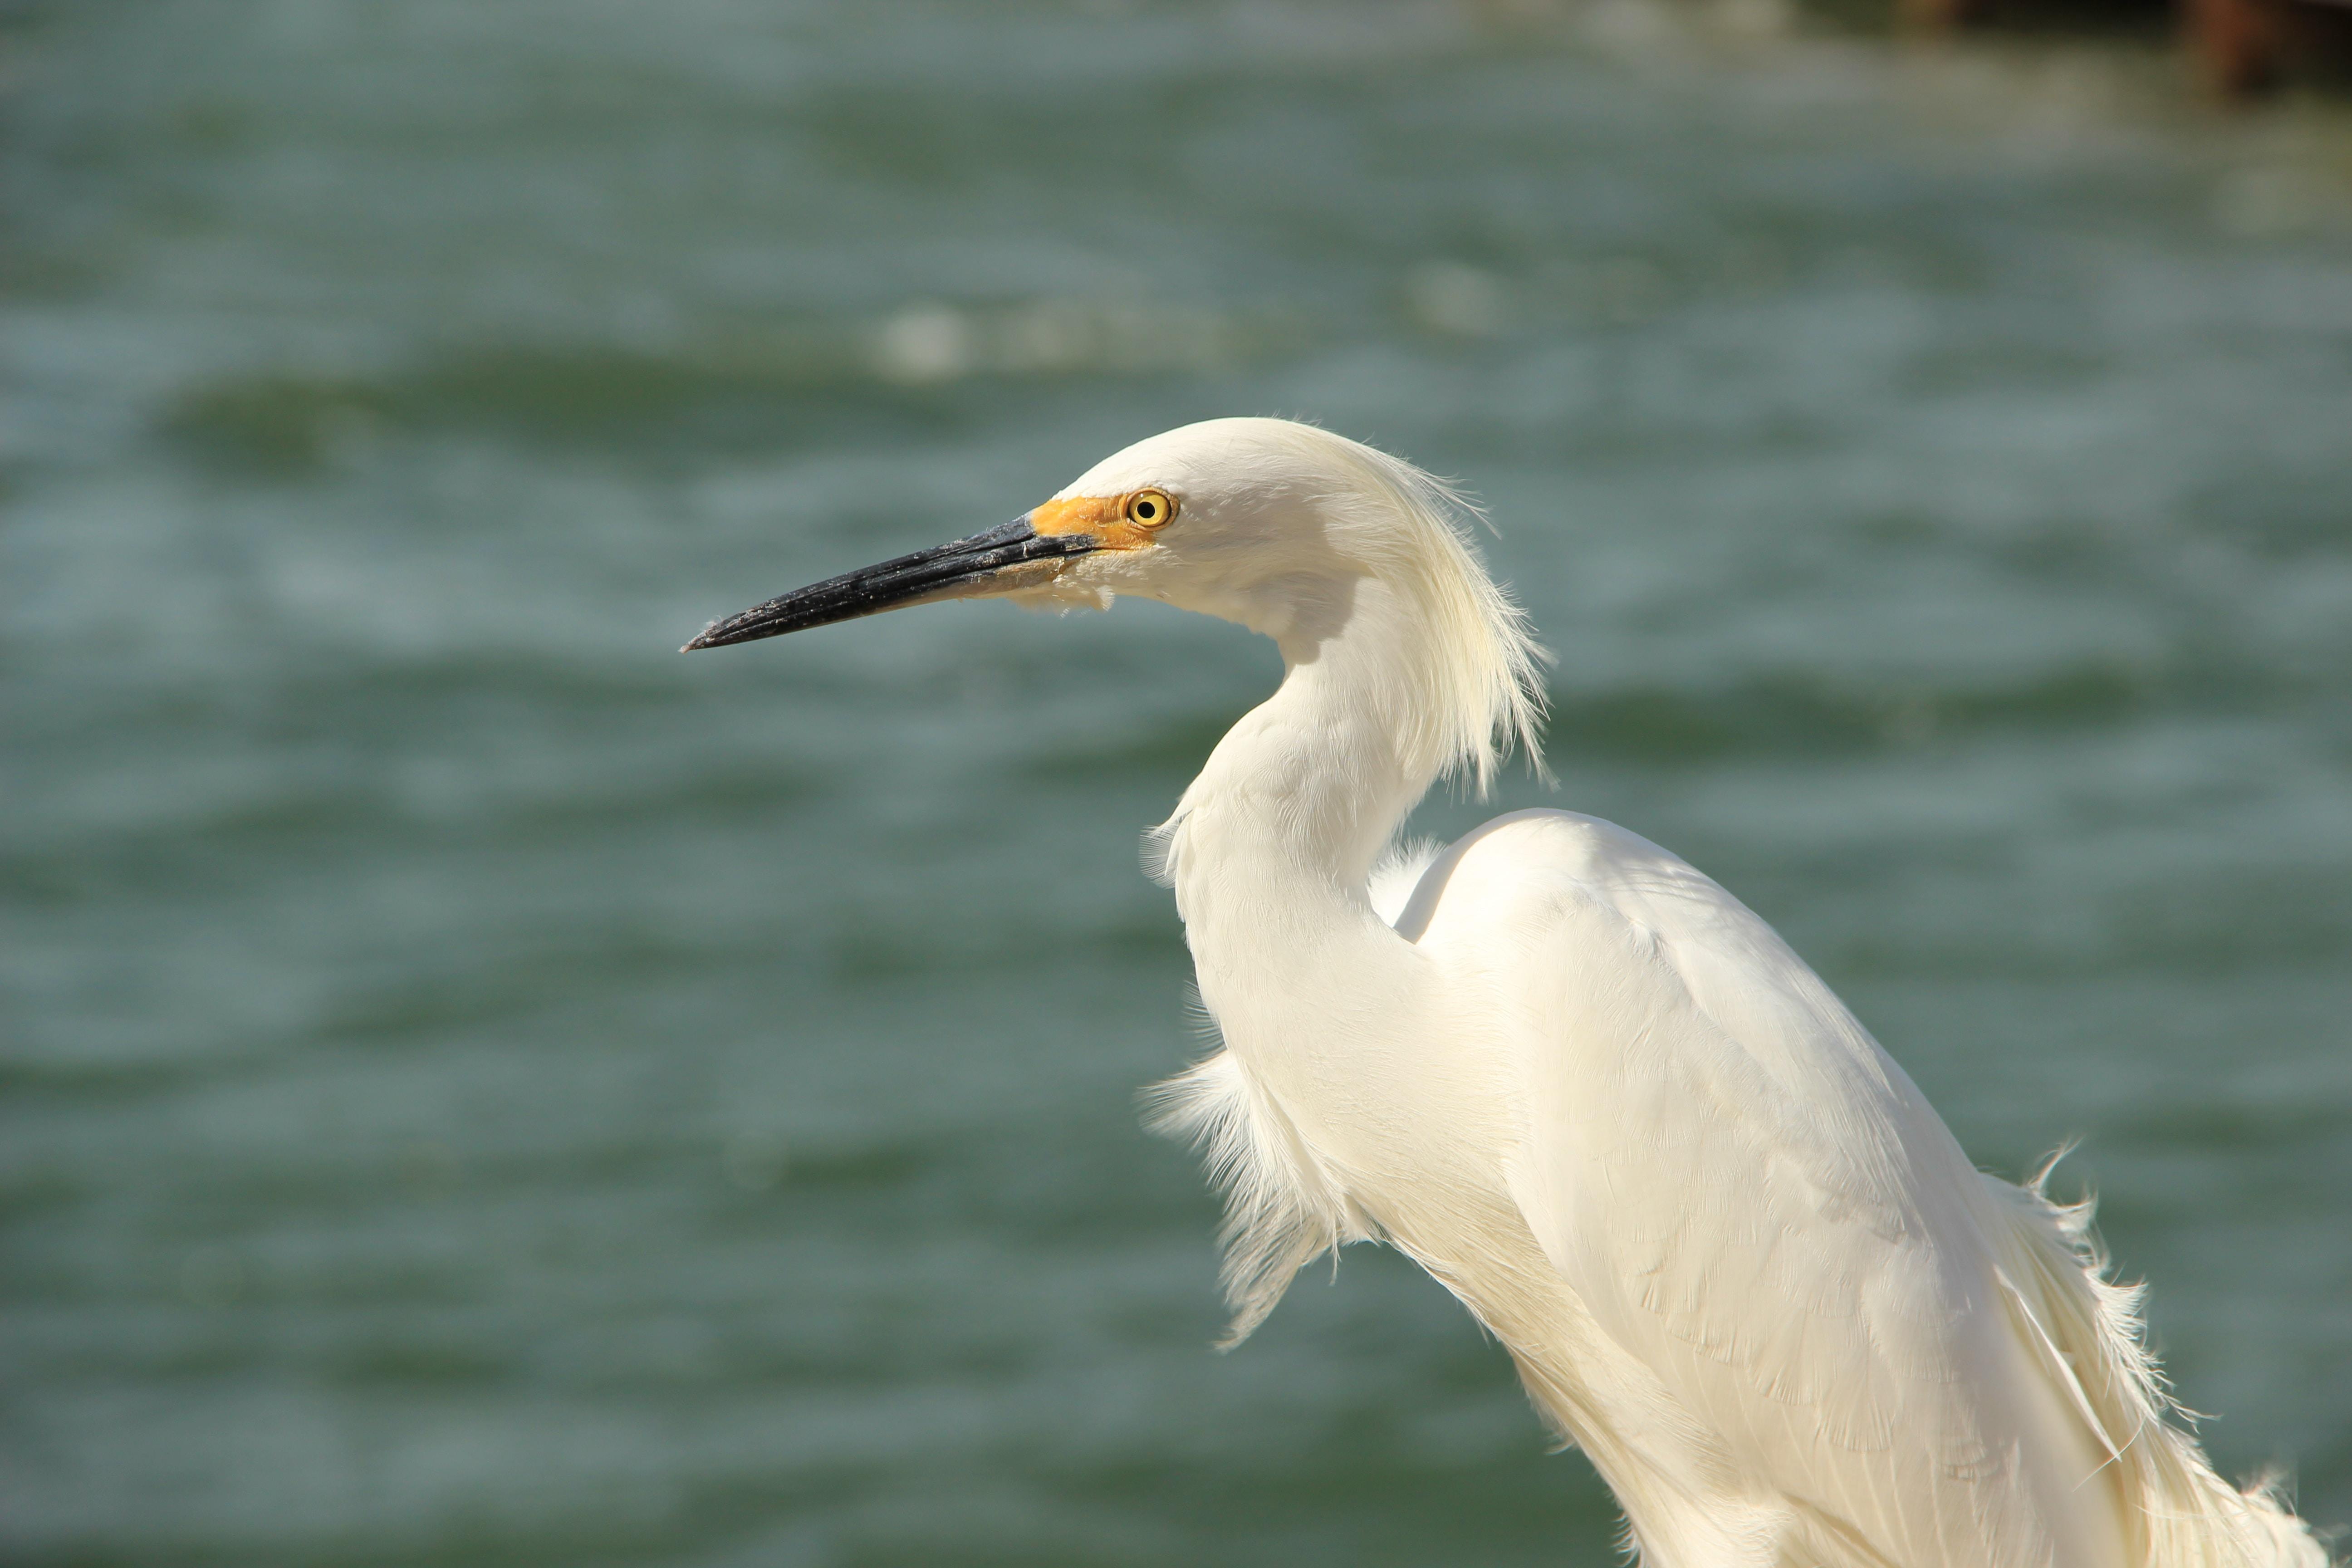 macro shot photography of white bird near body of water during daytime